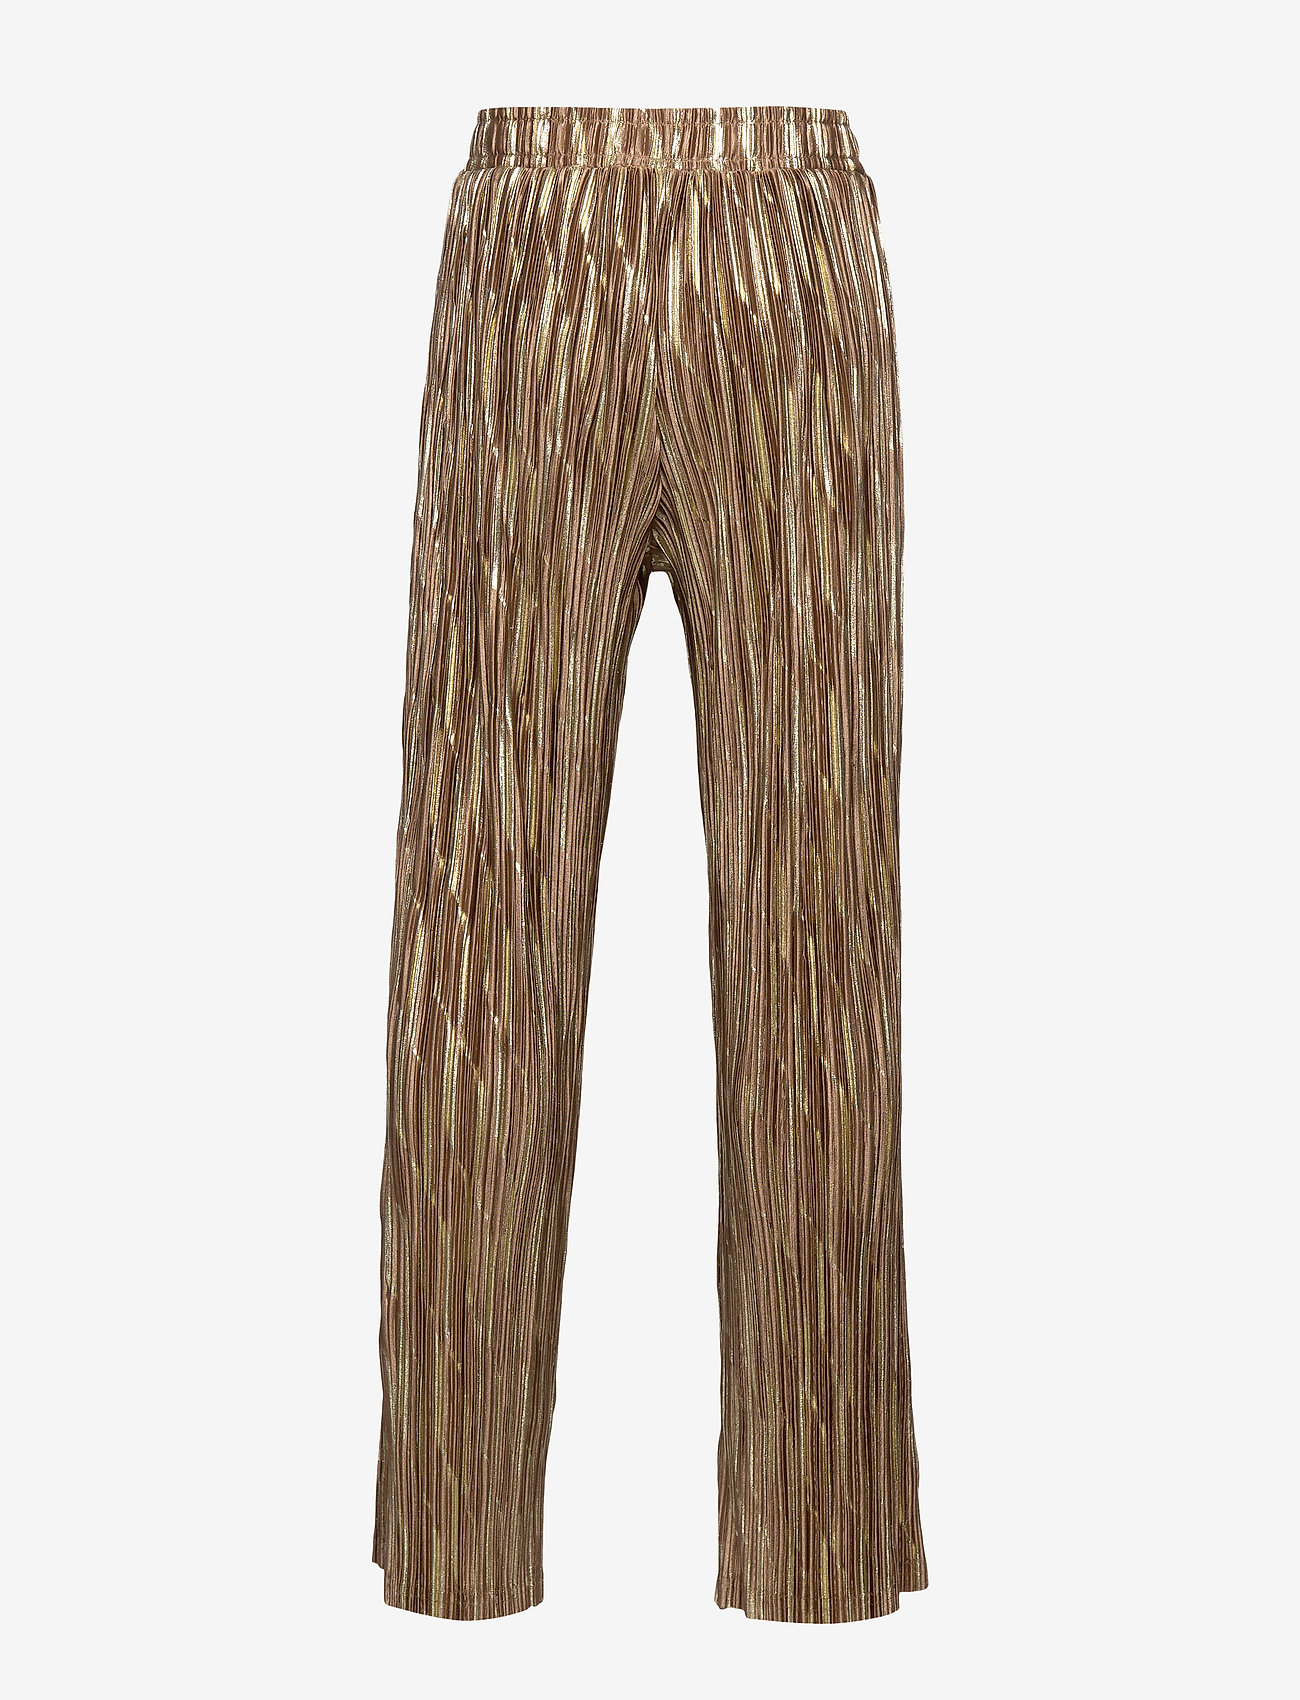 Petit by Sofie Schnoor - Pants - pantalons - camel - 1